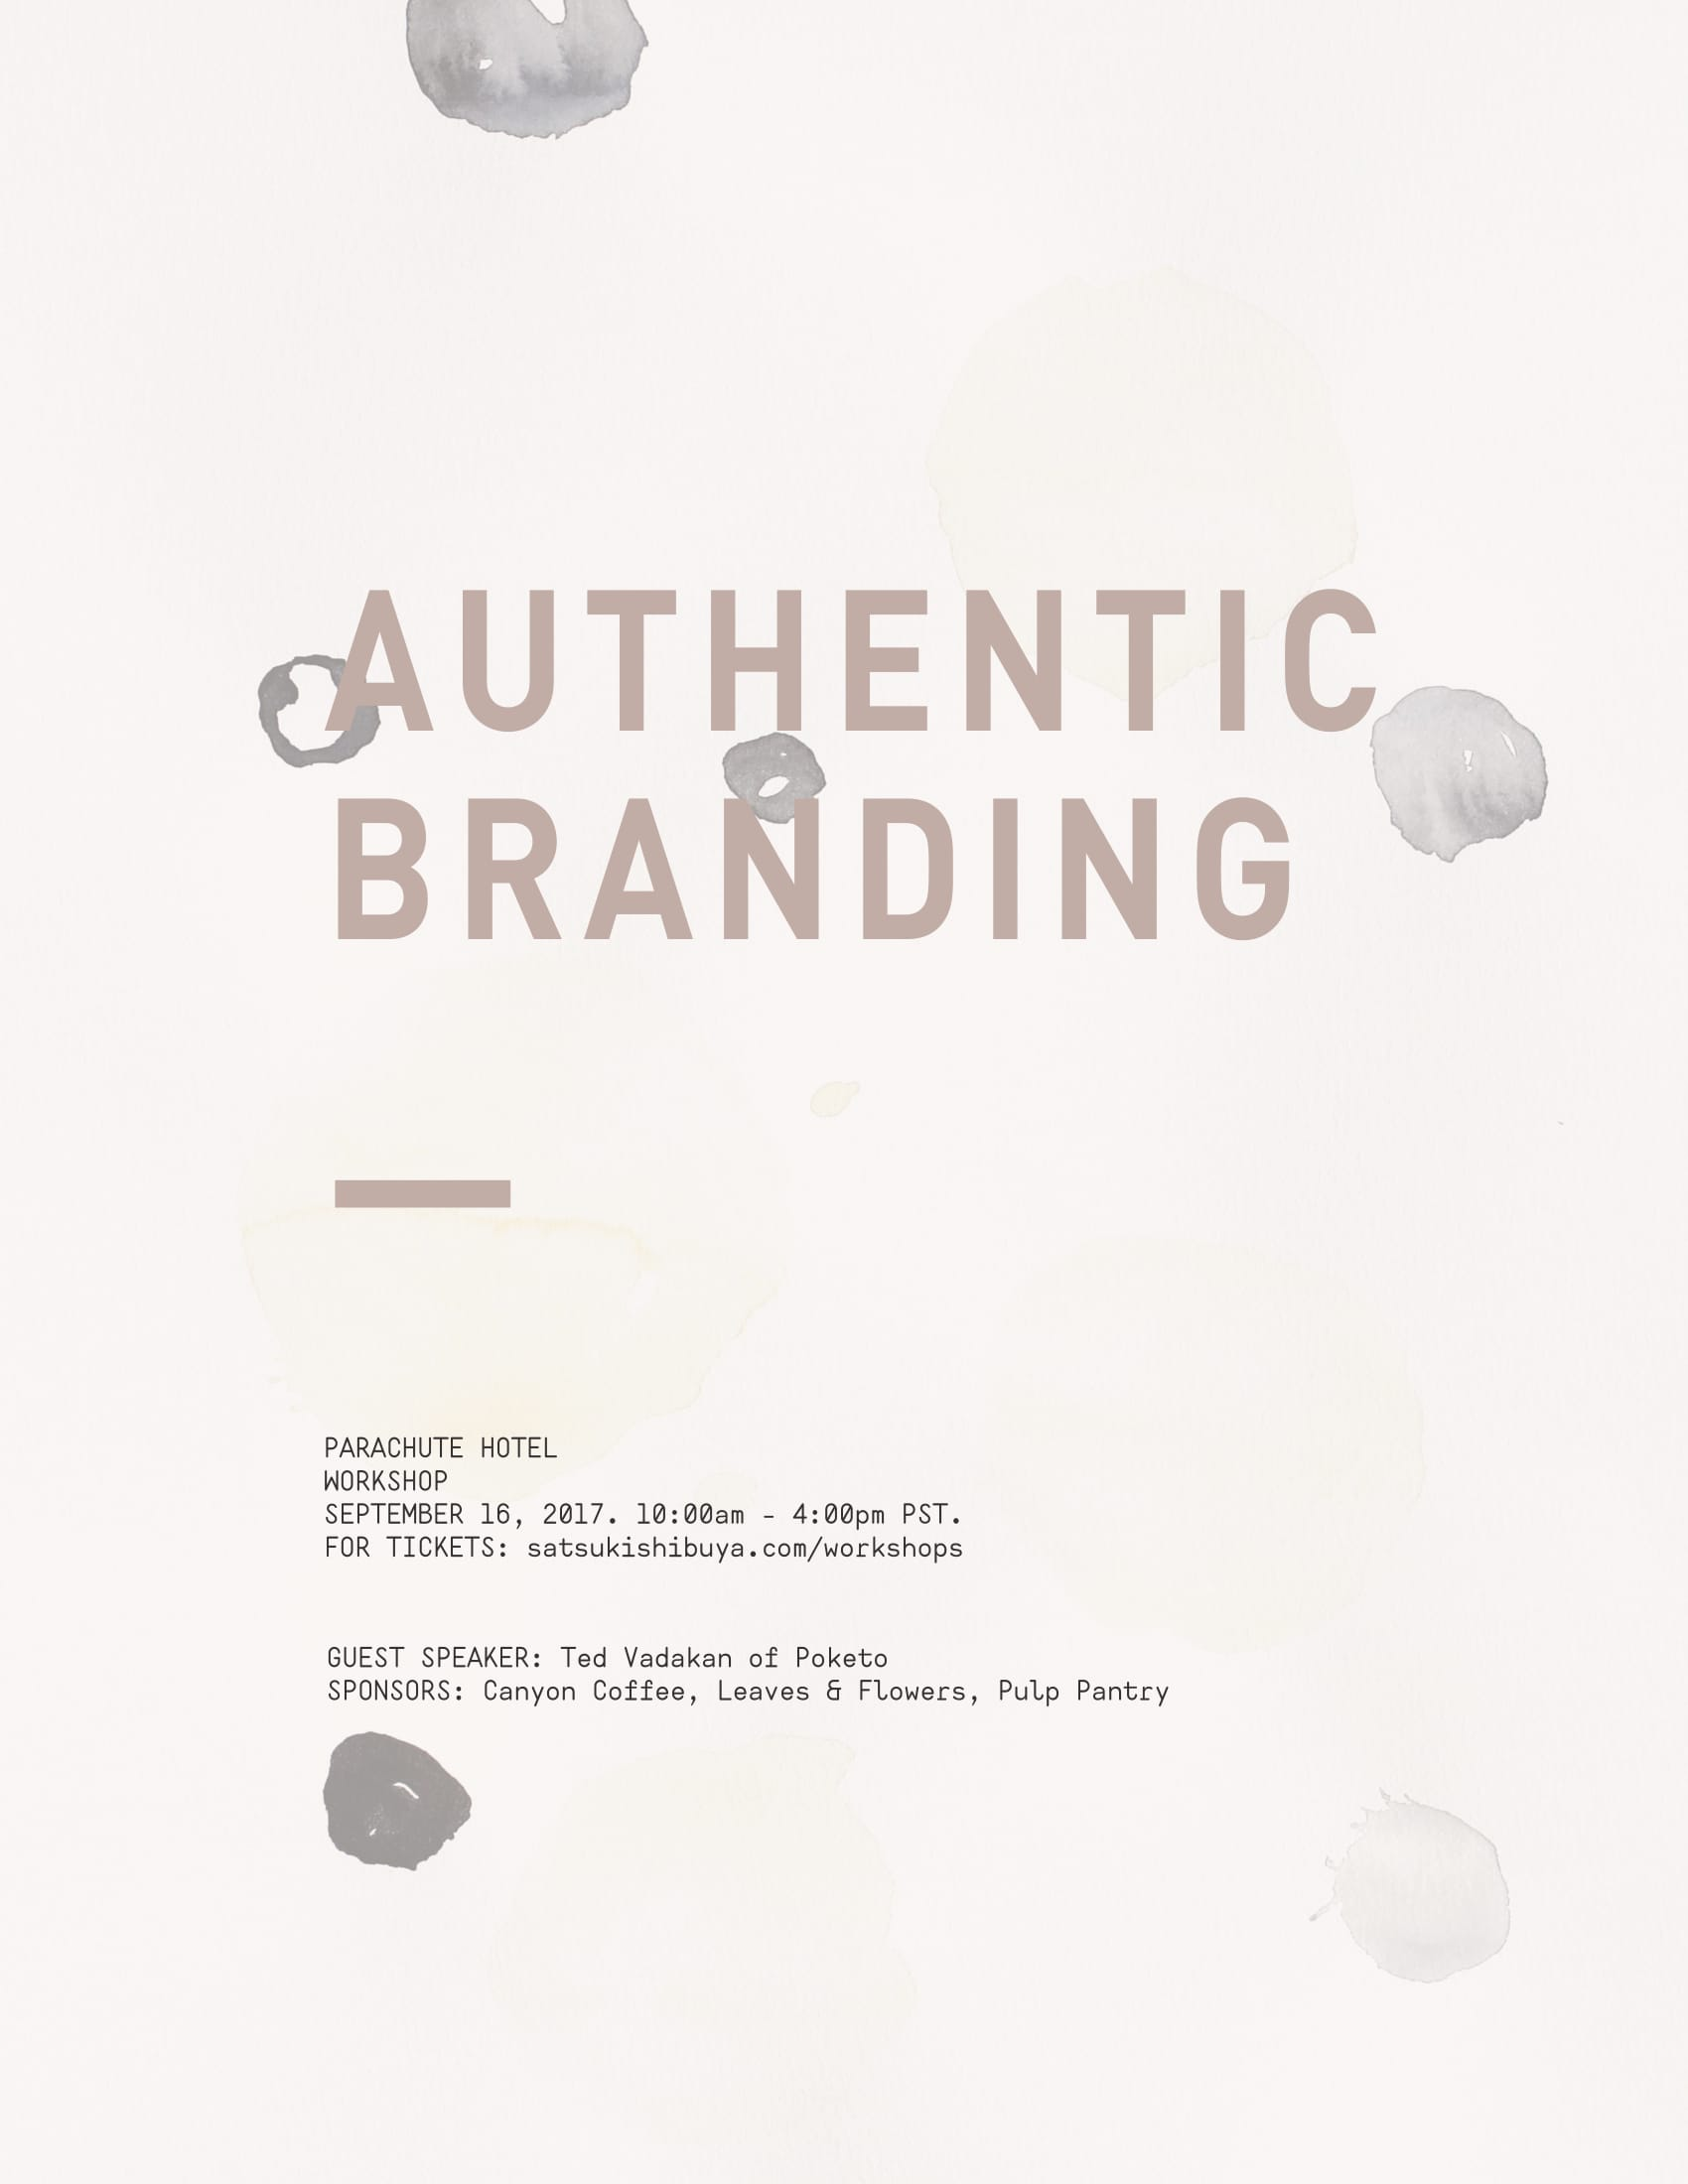 Authentic Branding Workshop with Satsuki Shibuya